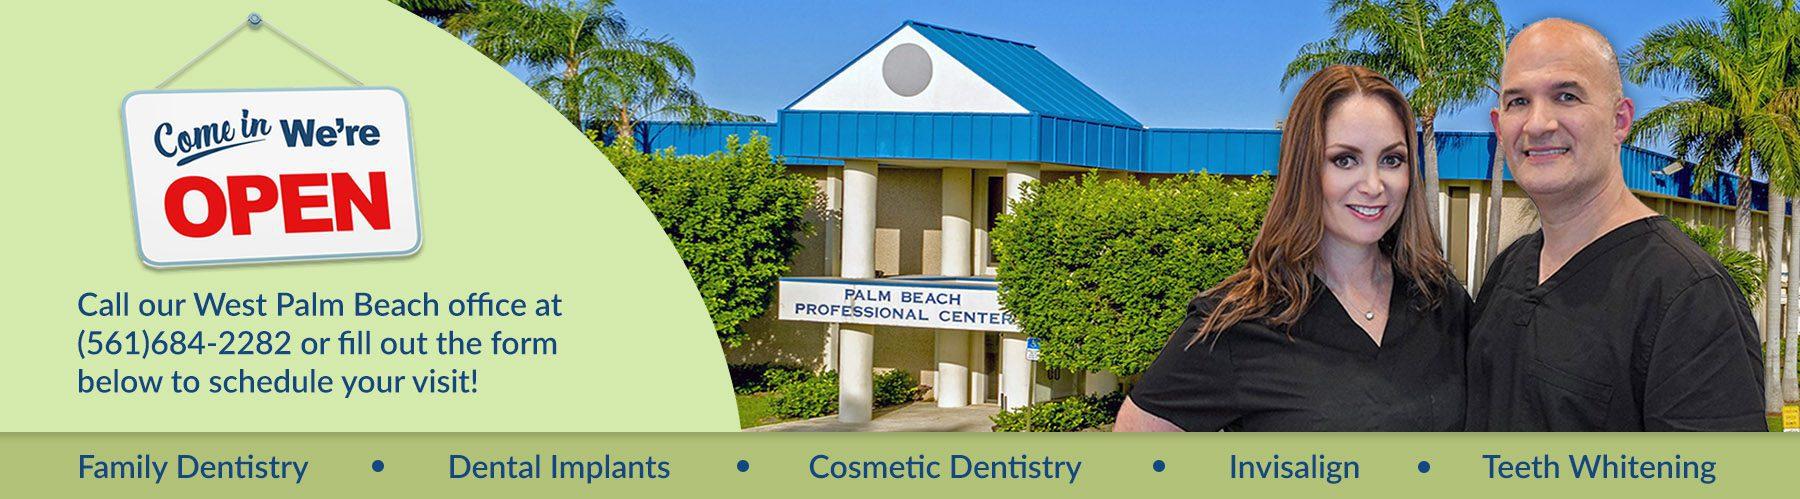 West Palm Beach Dentist Office